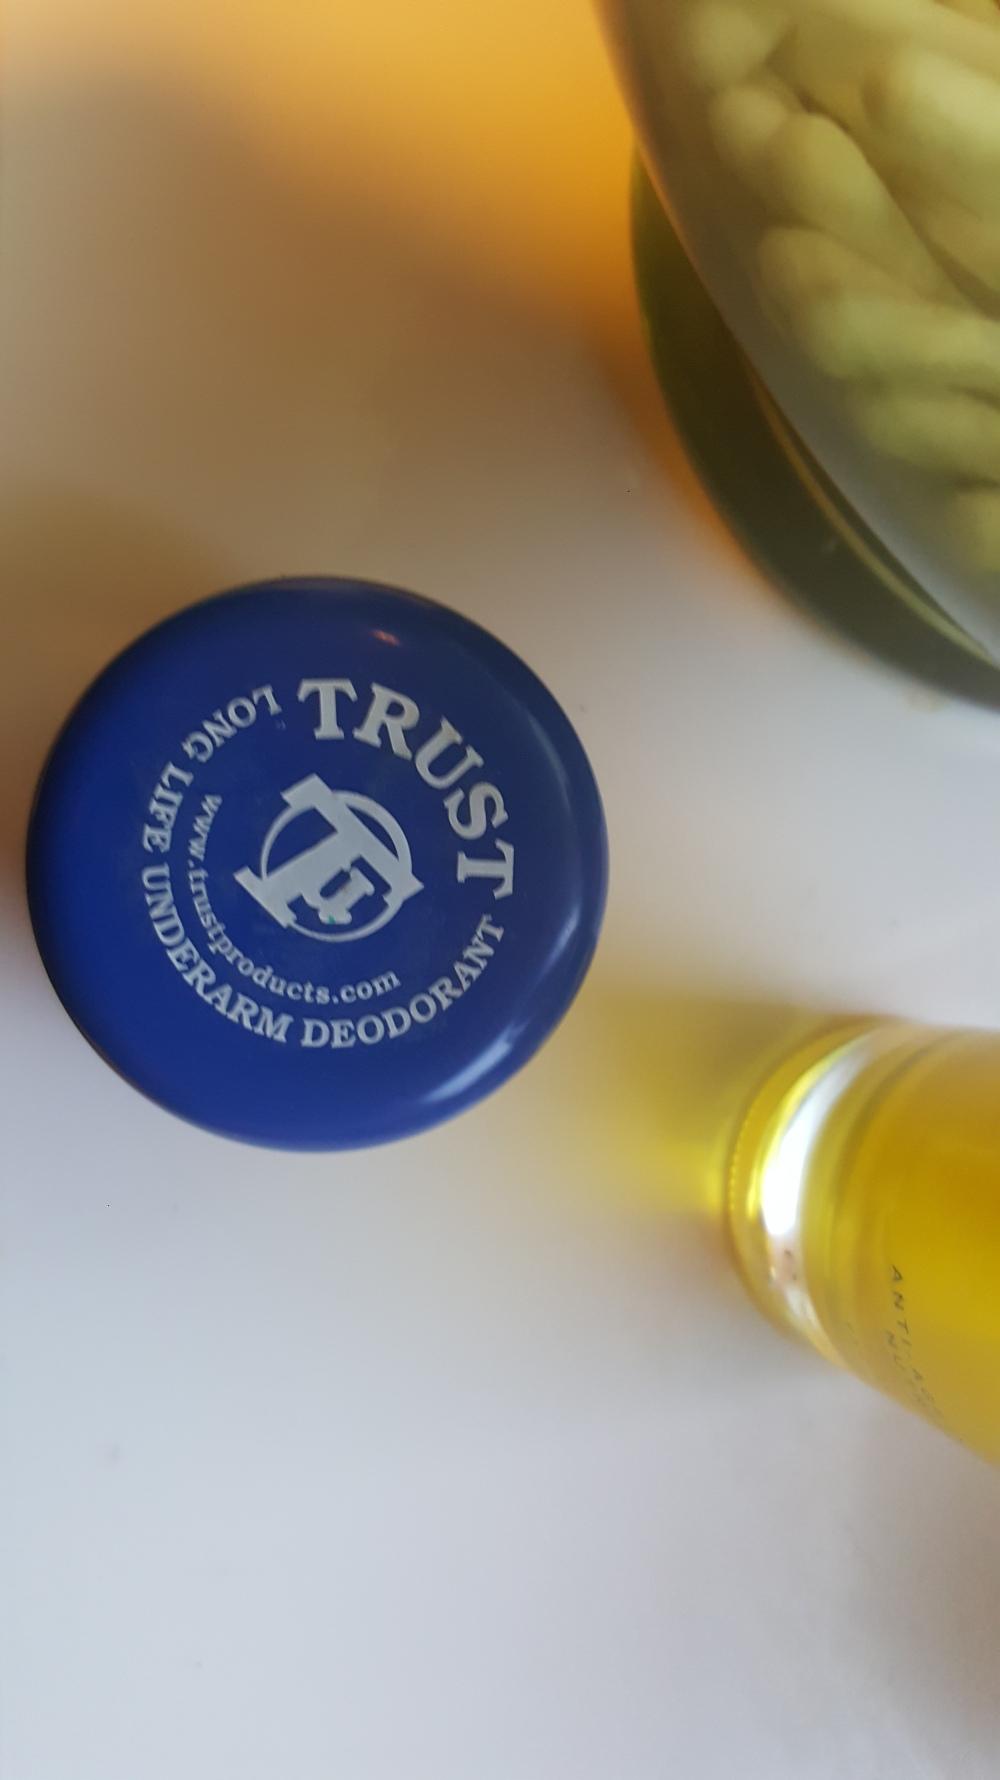 Smellcontroldeodorant